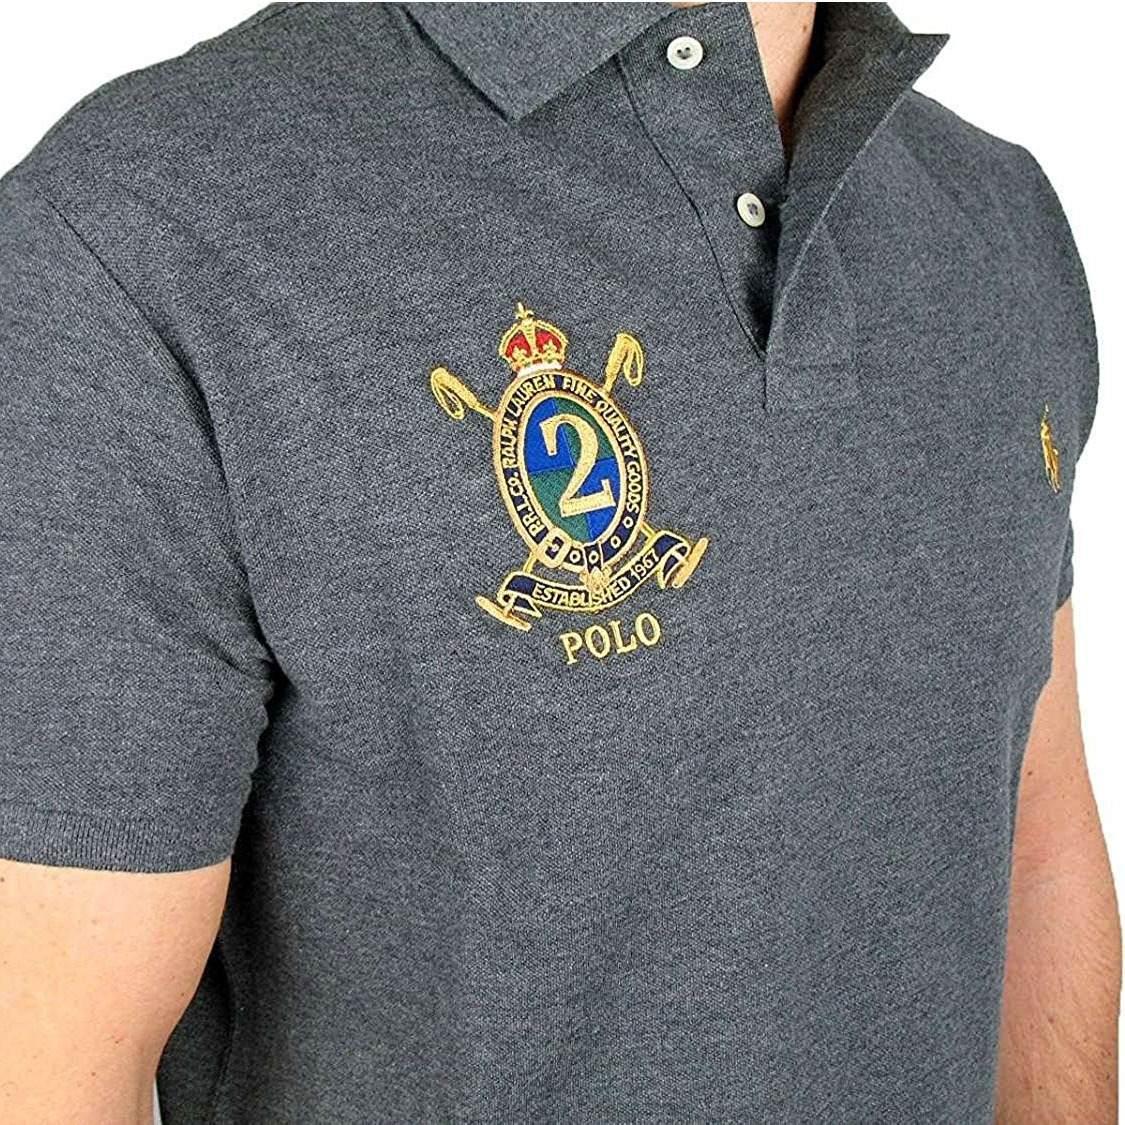 fad29942bc camisa polo ralph lauren masculina 100% original - p3. Carregando zoom.